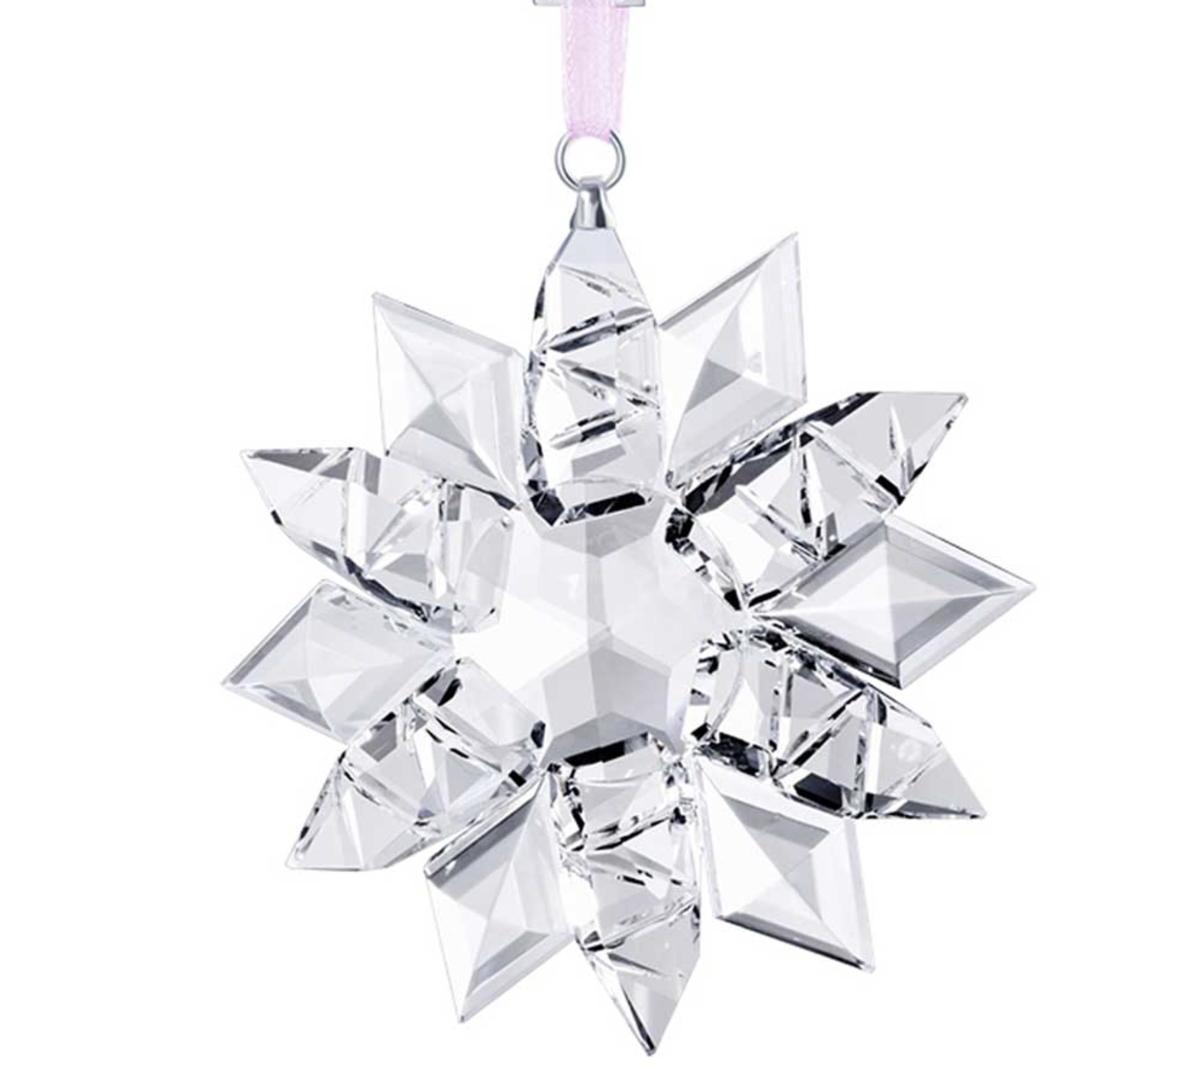 addobbi-natalizi-cristallo-foto-idee-costi-8